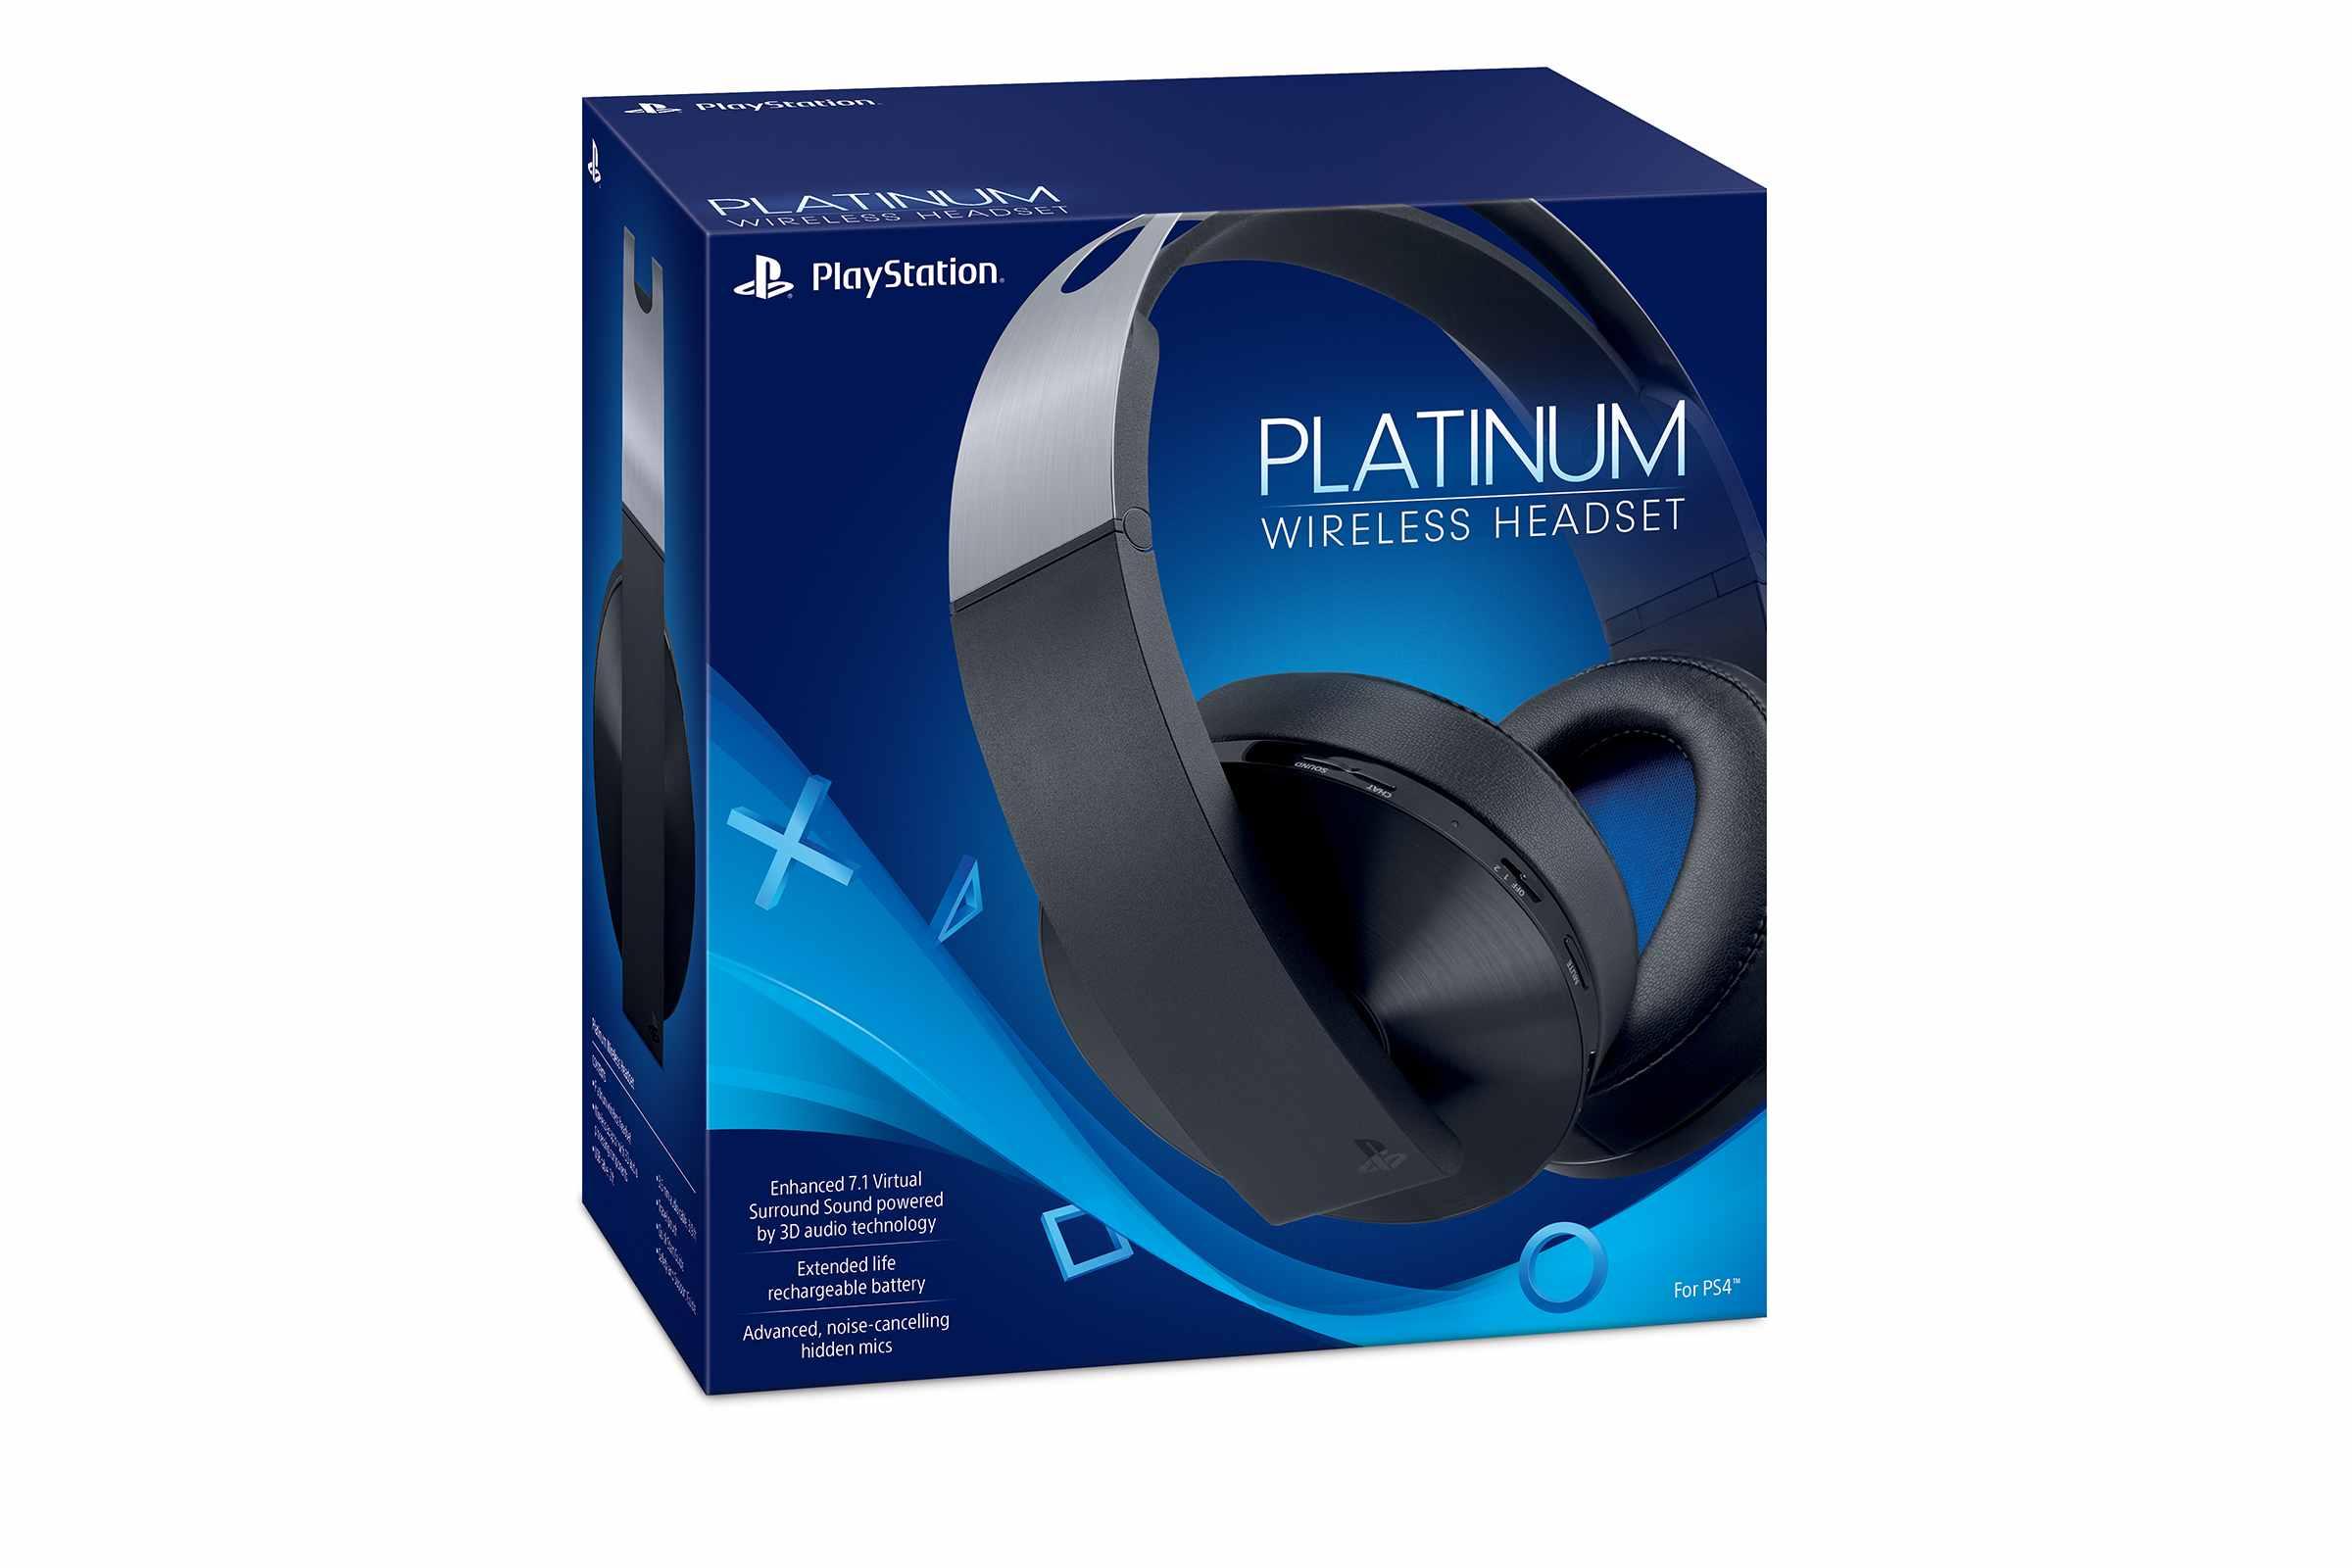 SONY PS4 Platinum Wireless Headset